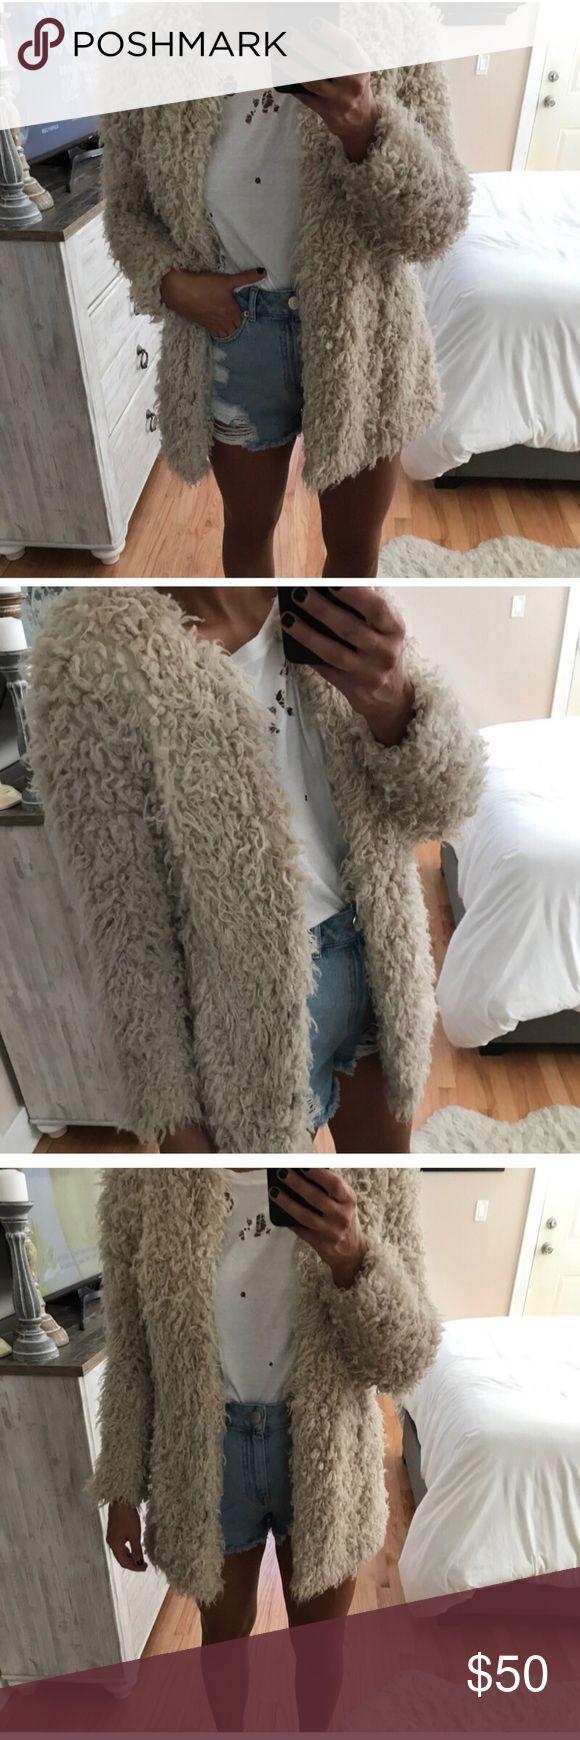 Zara faux sheepskin shag coat In perfect condition Zara Jackets & Coats